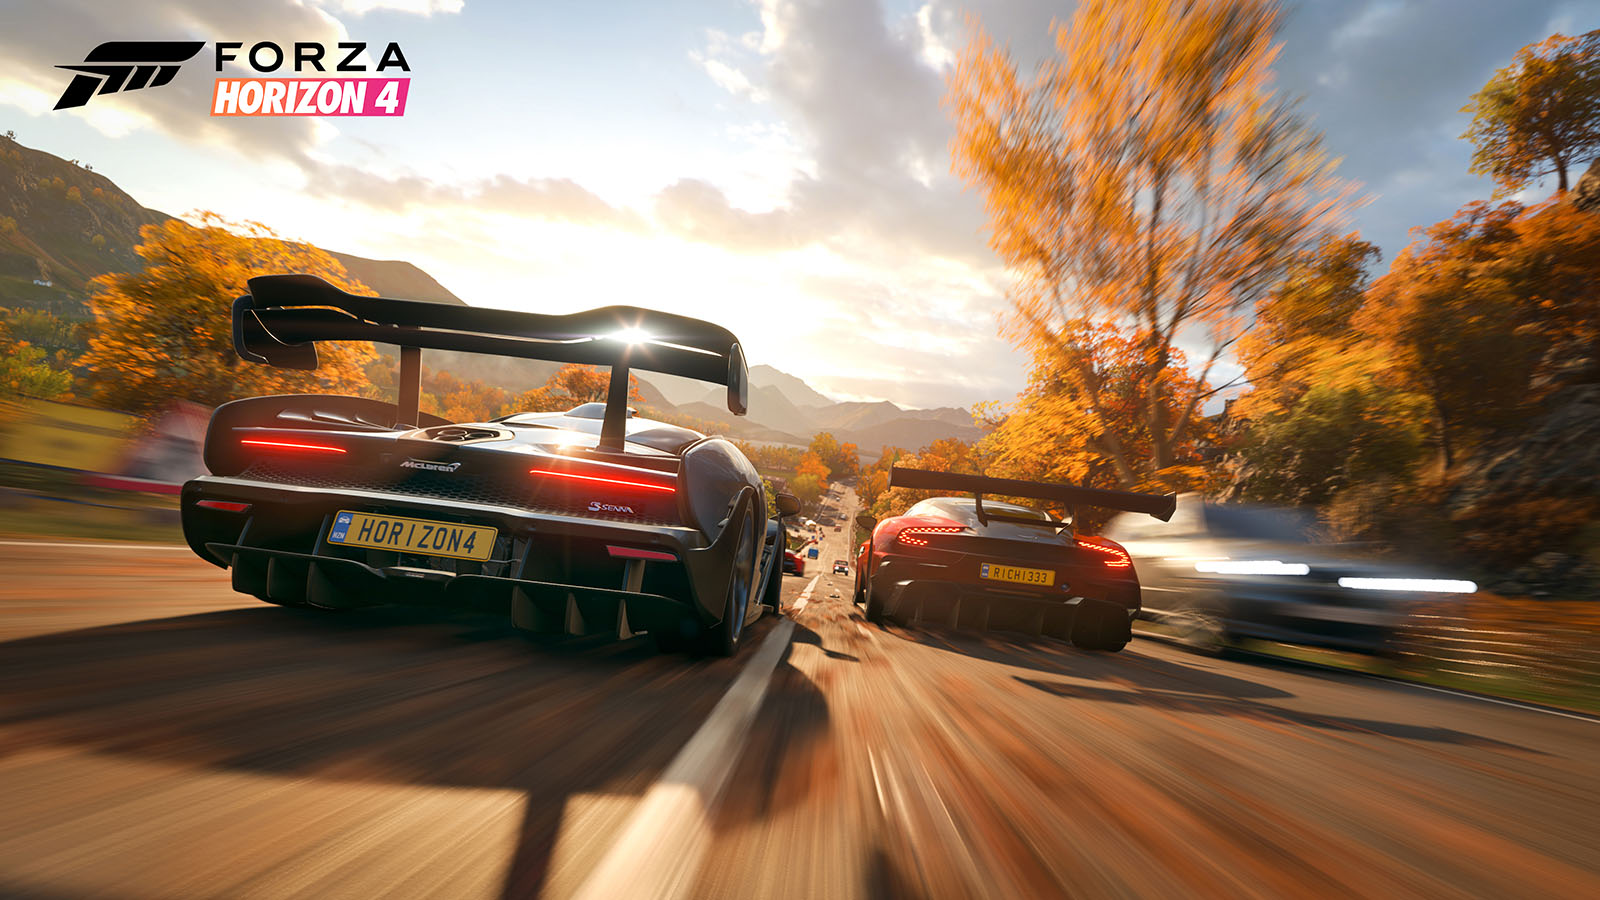 Forza Horizon 4 Series 28 Autumn Update